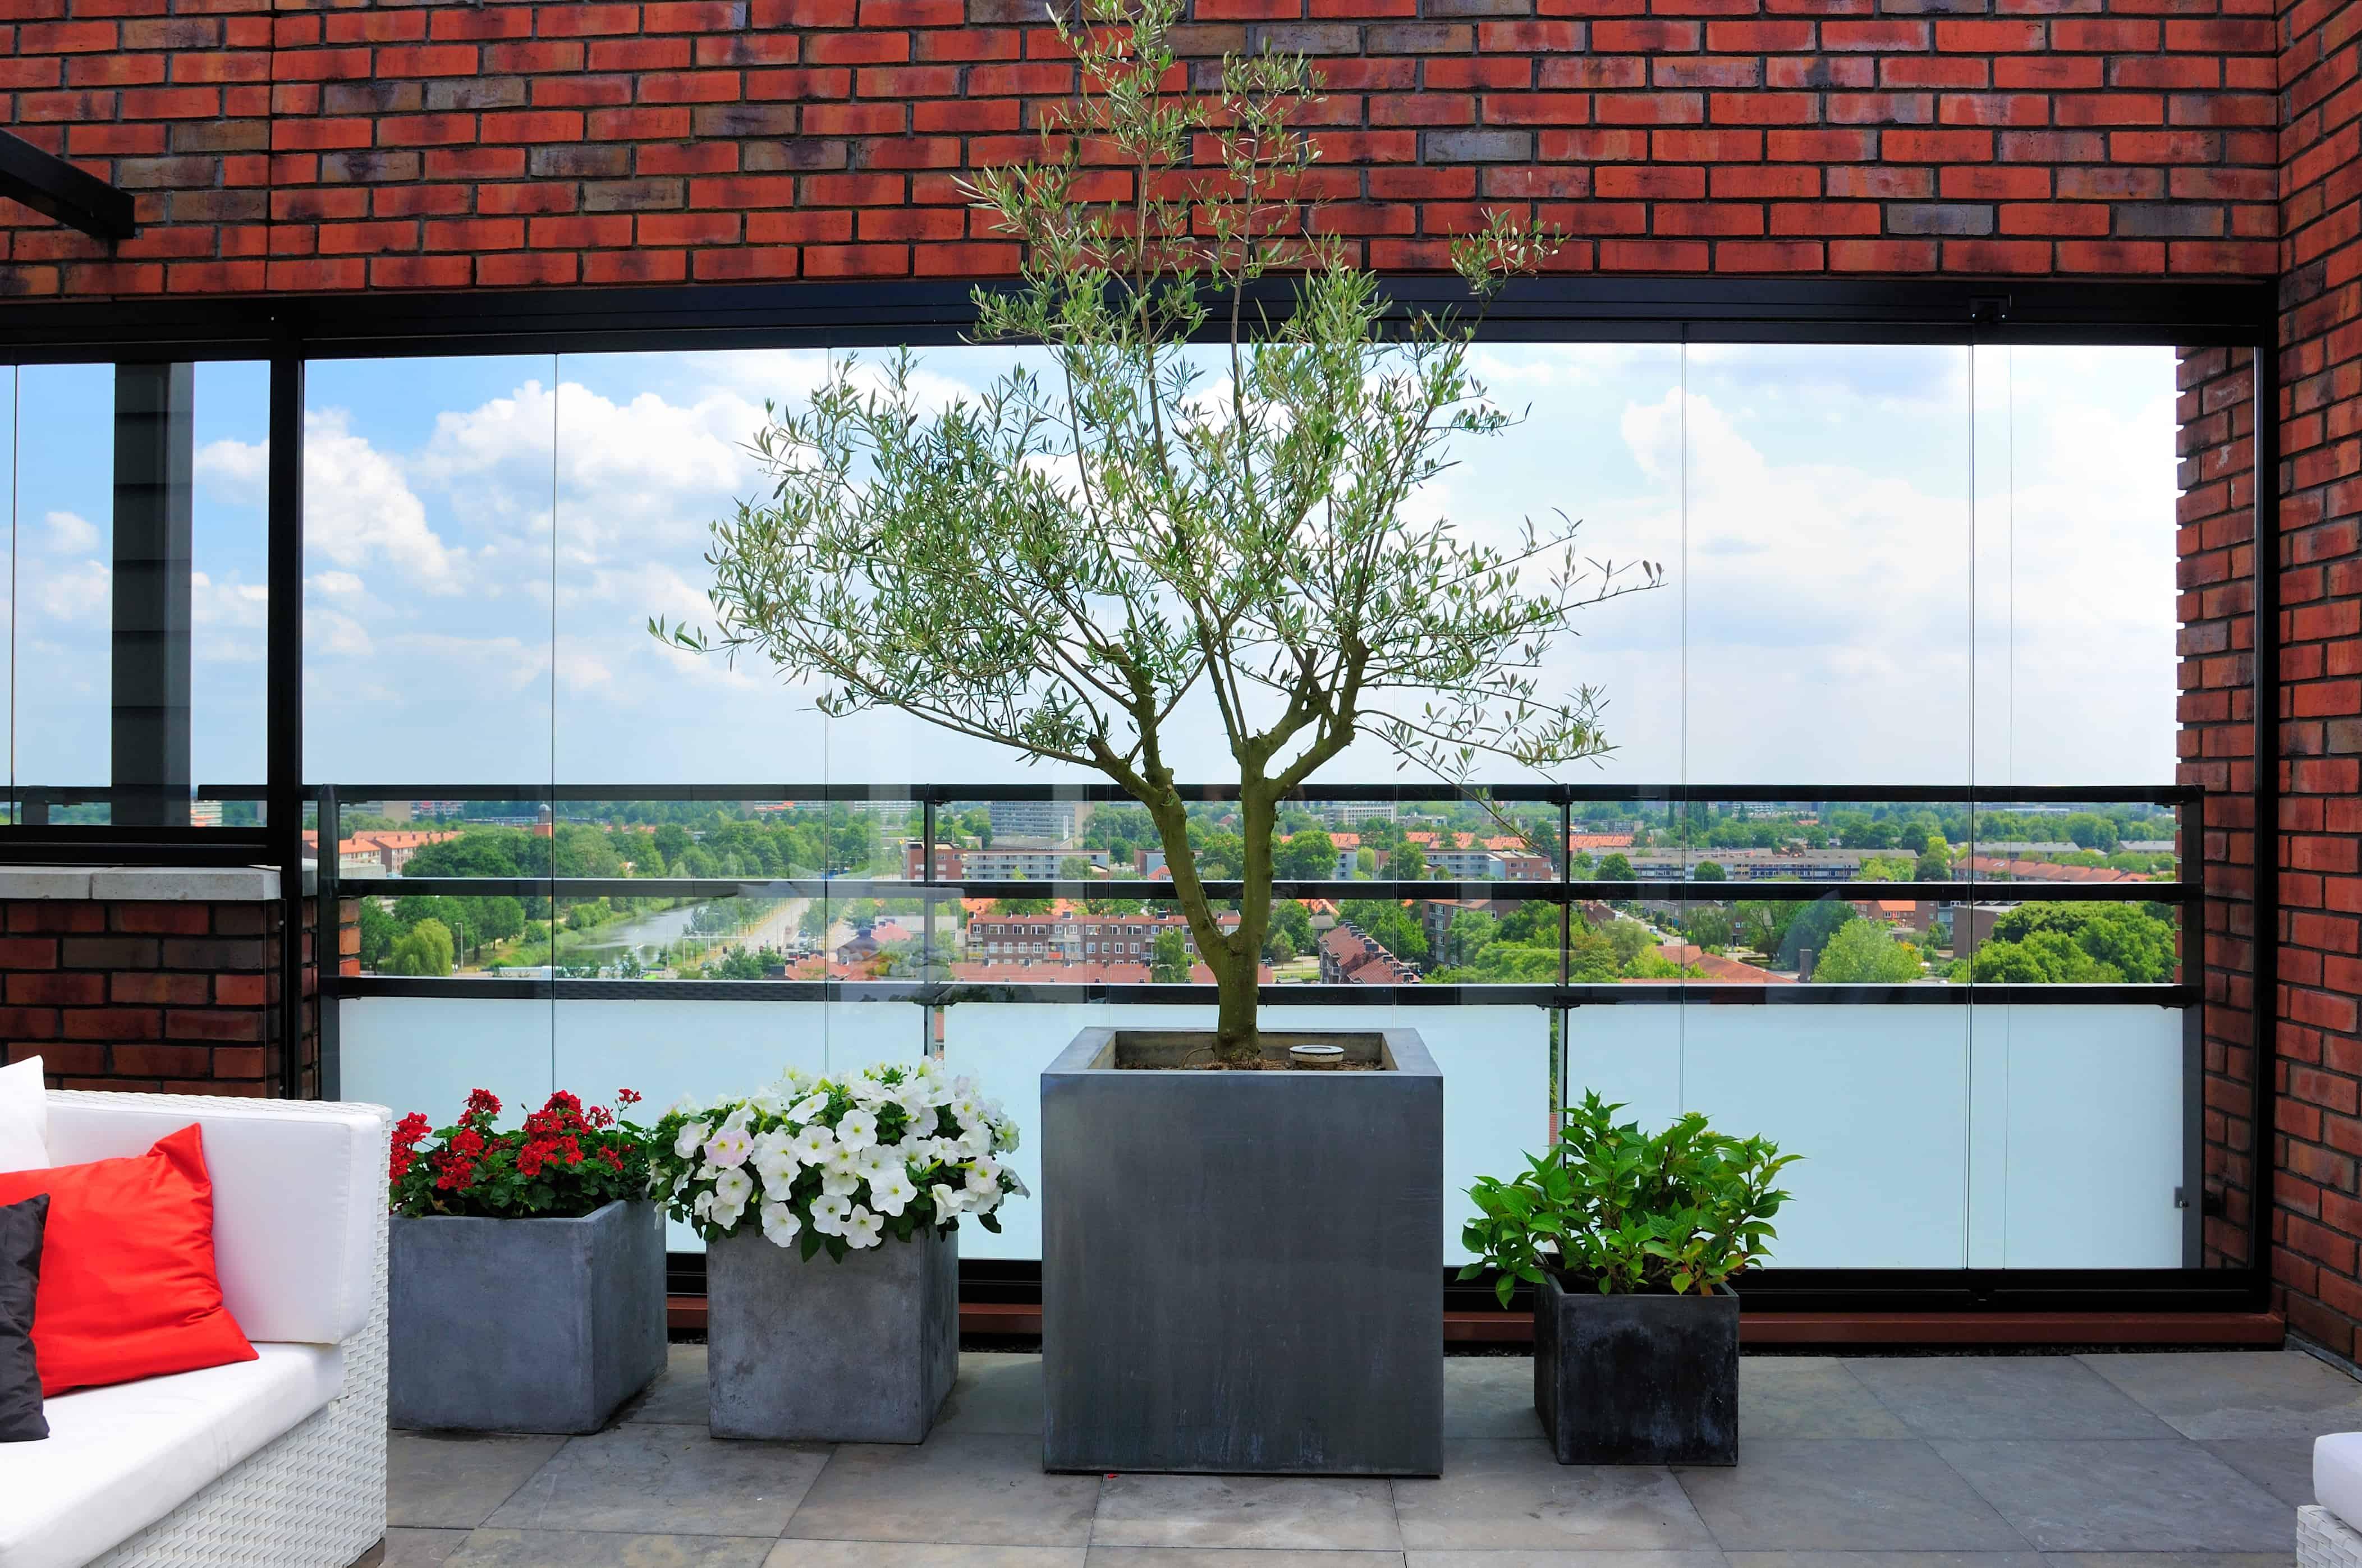 De Balkonbeglazer - Balkonbeglazing vergunning